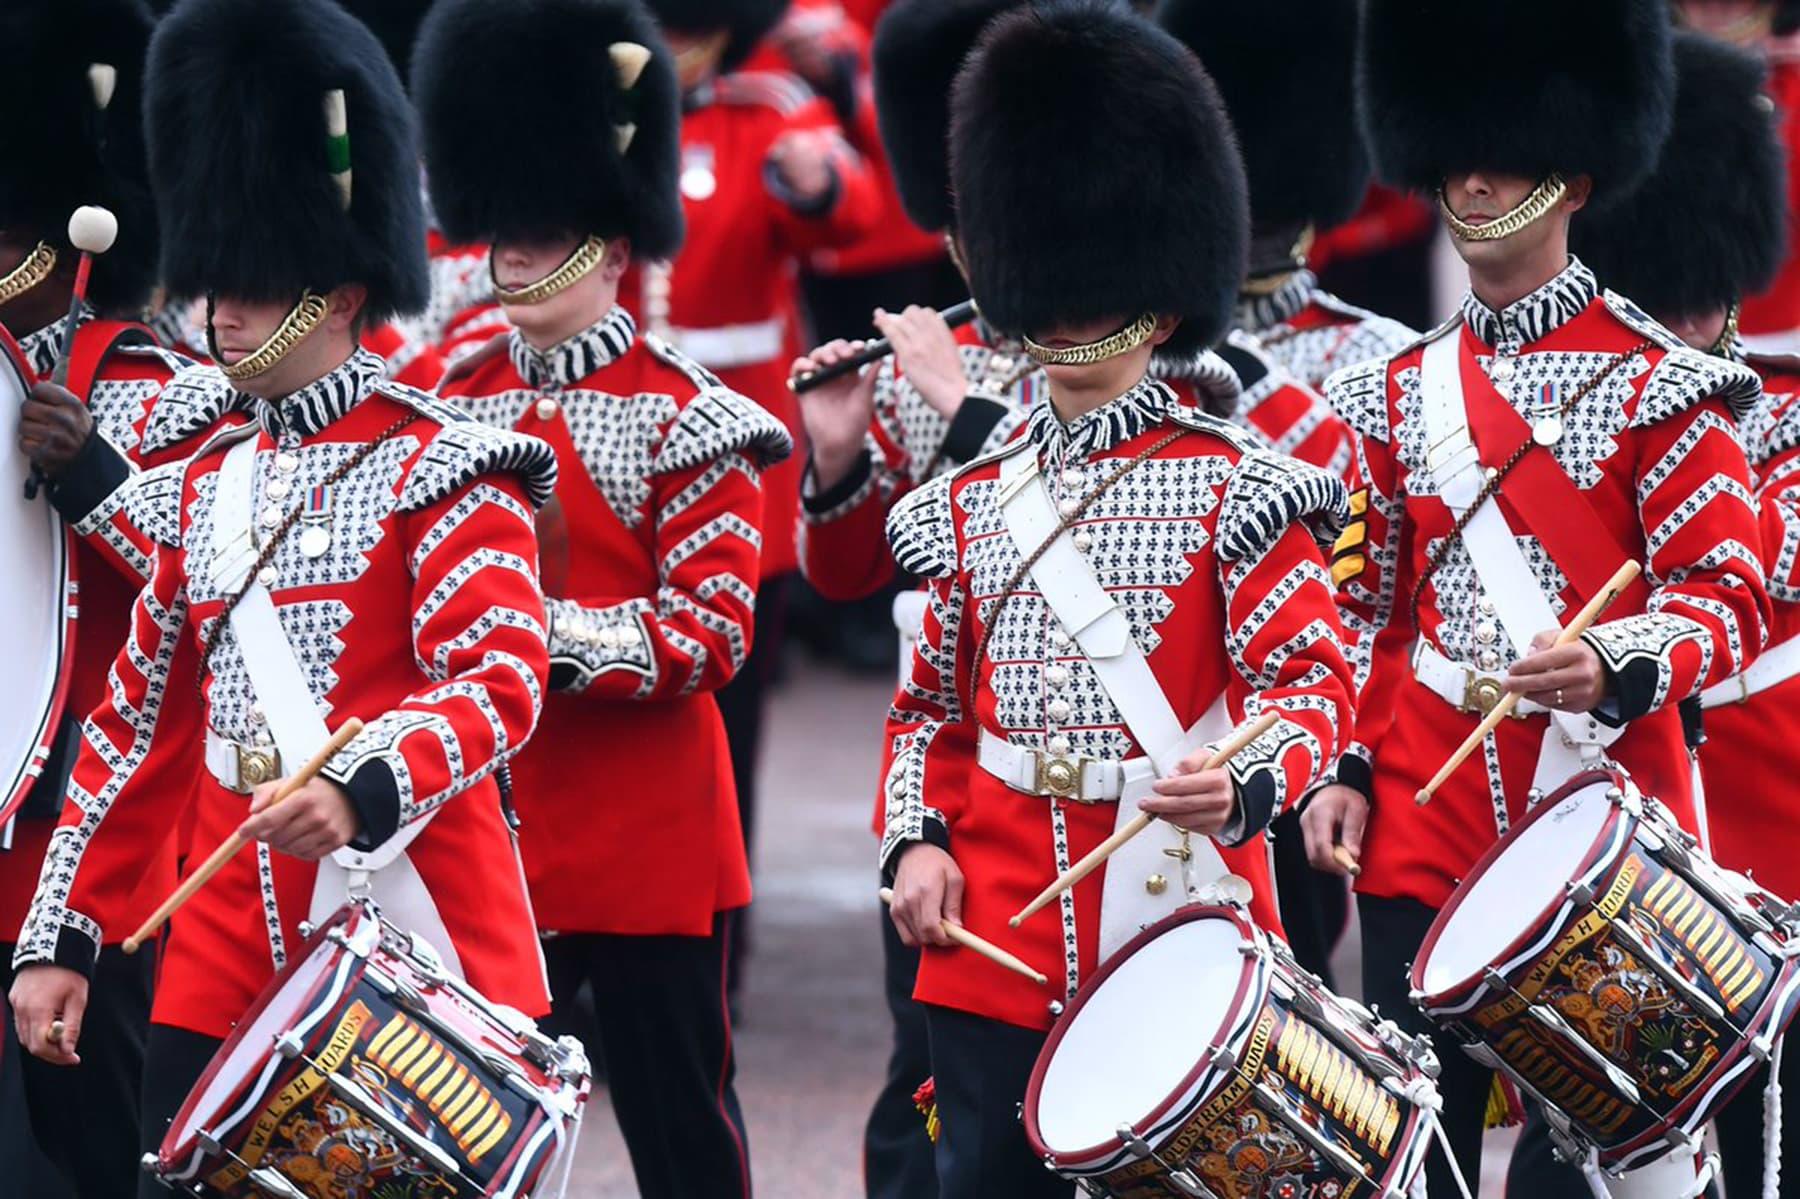 The Massed Bands perform. — Photo courtesy @RoyalFamily